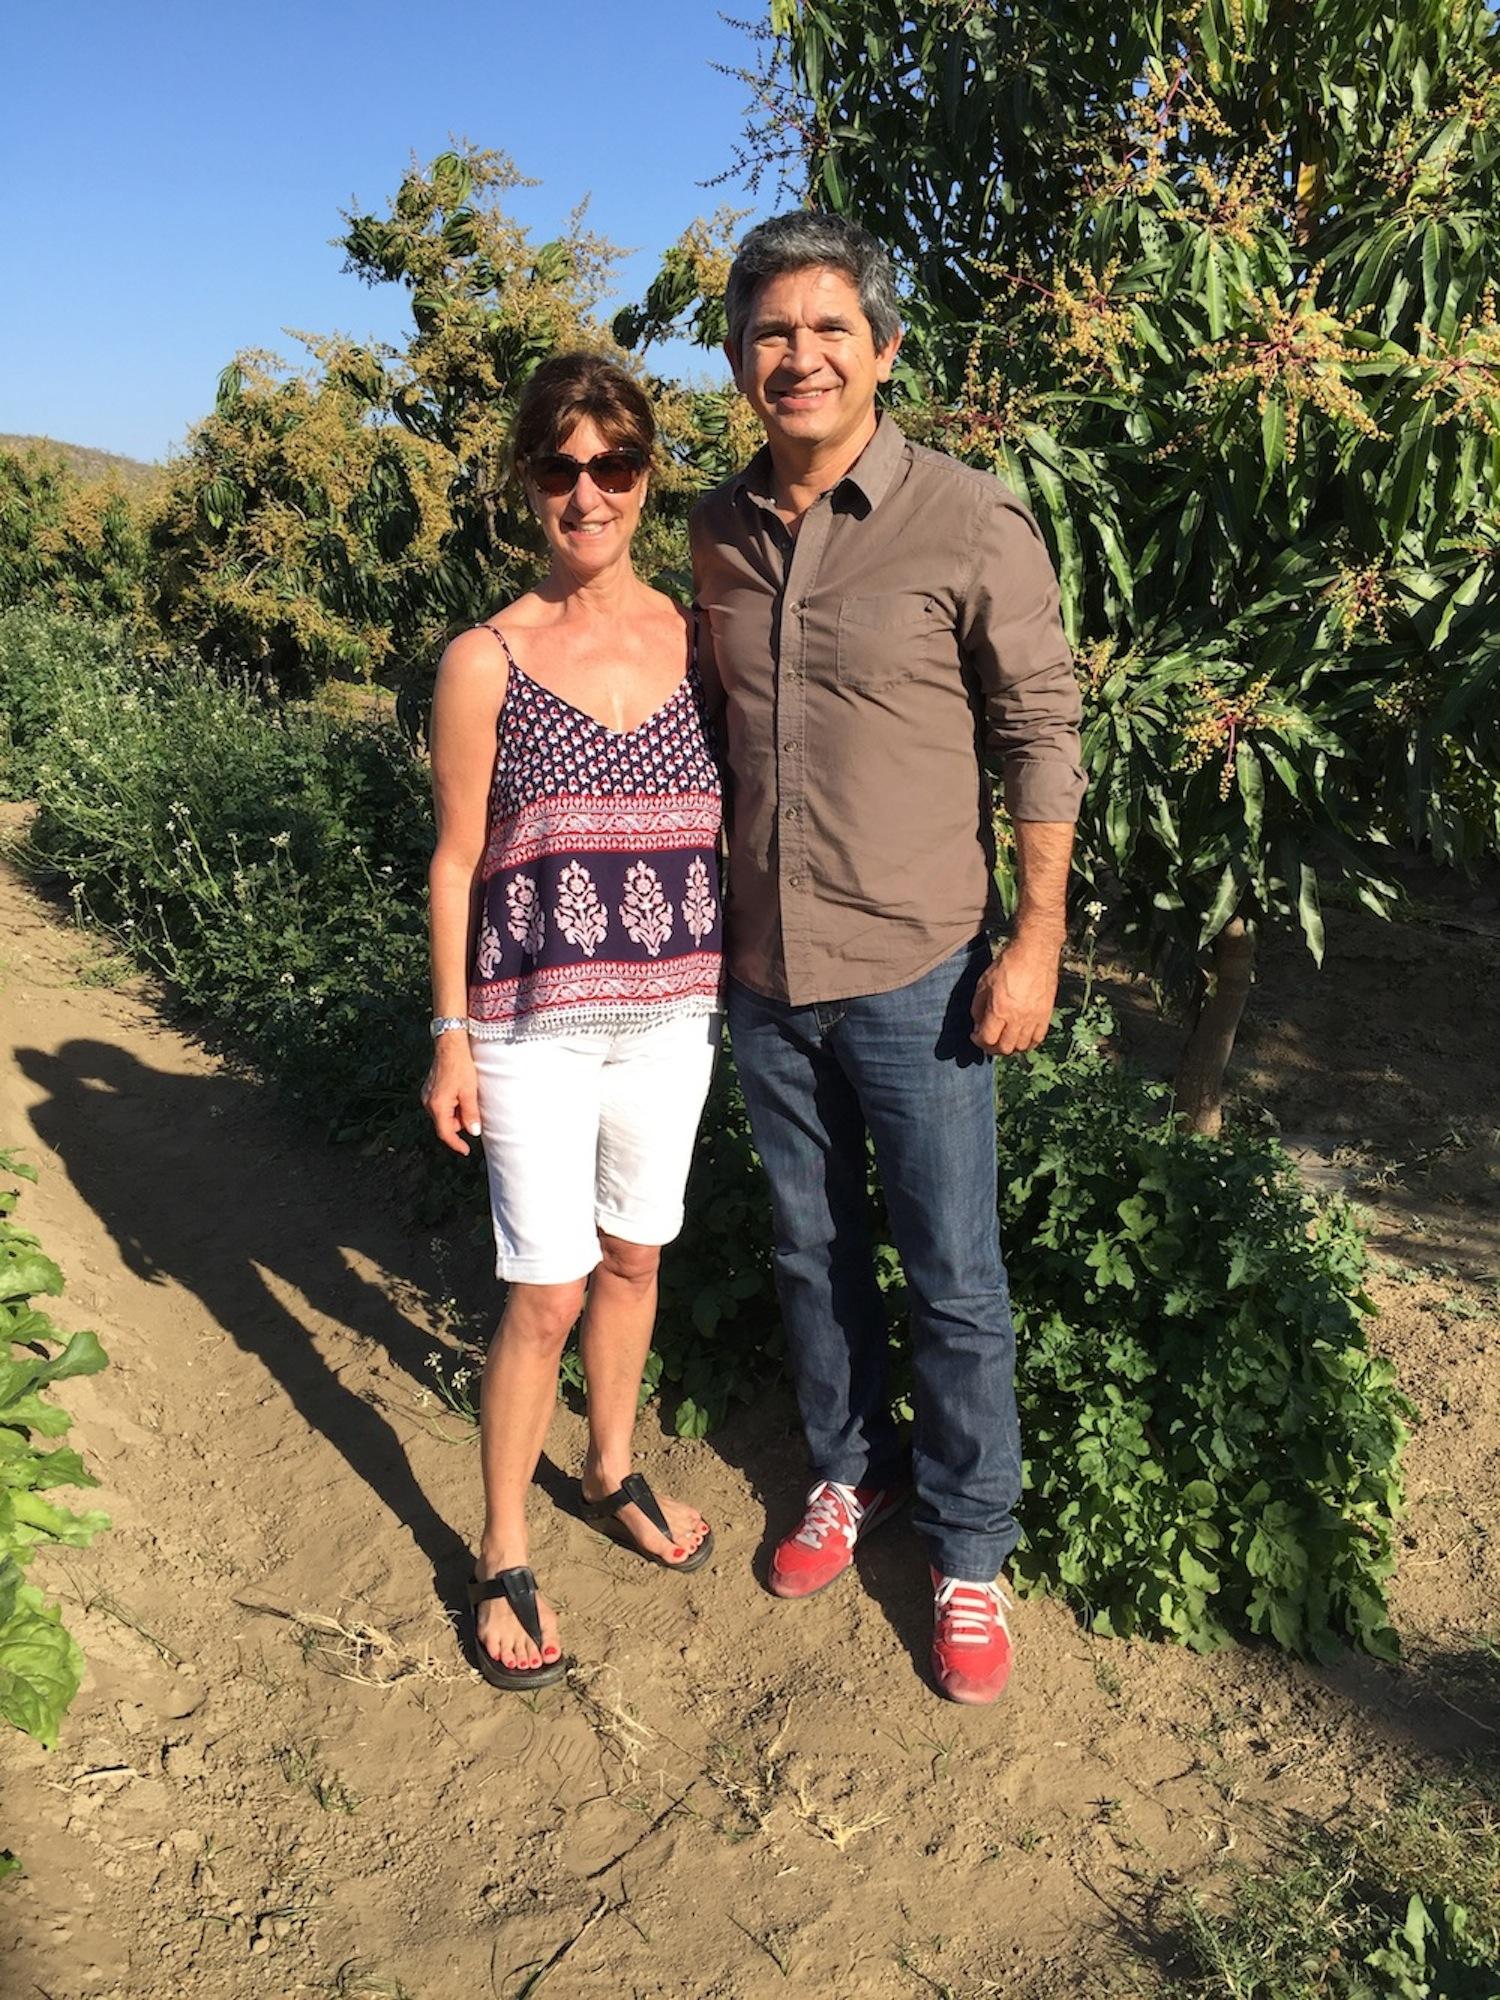 Lajollacooks4u Visit Organic Farm and Restaurant In San Jose del Cabo - PR Web (press release)